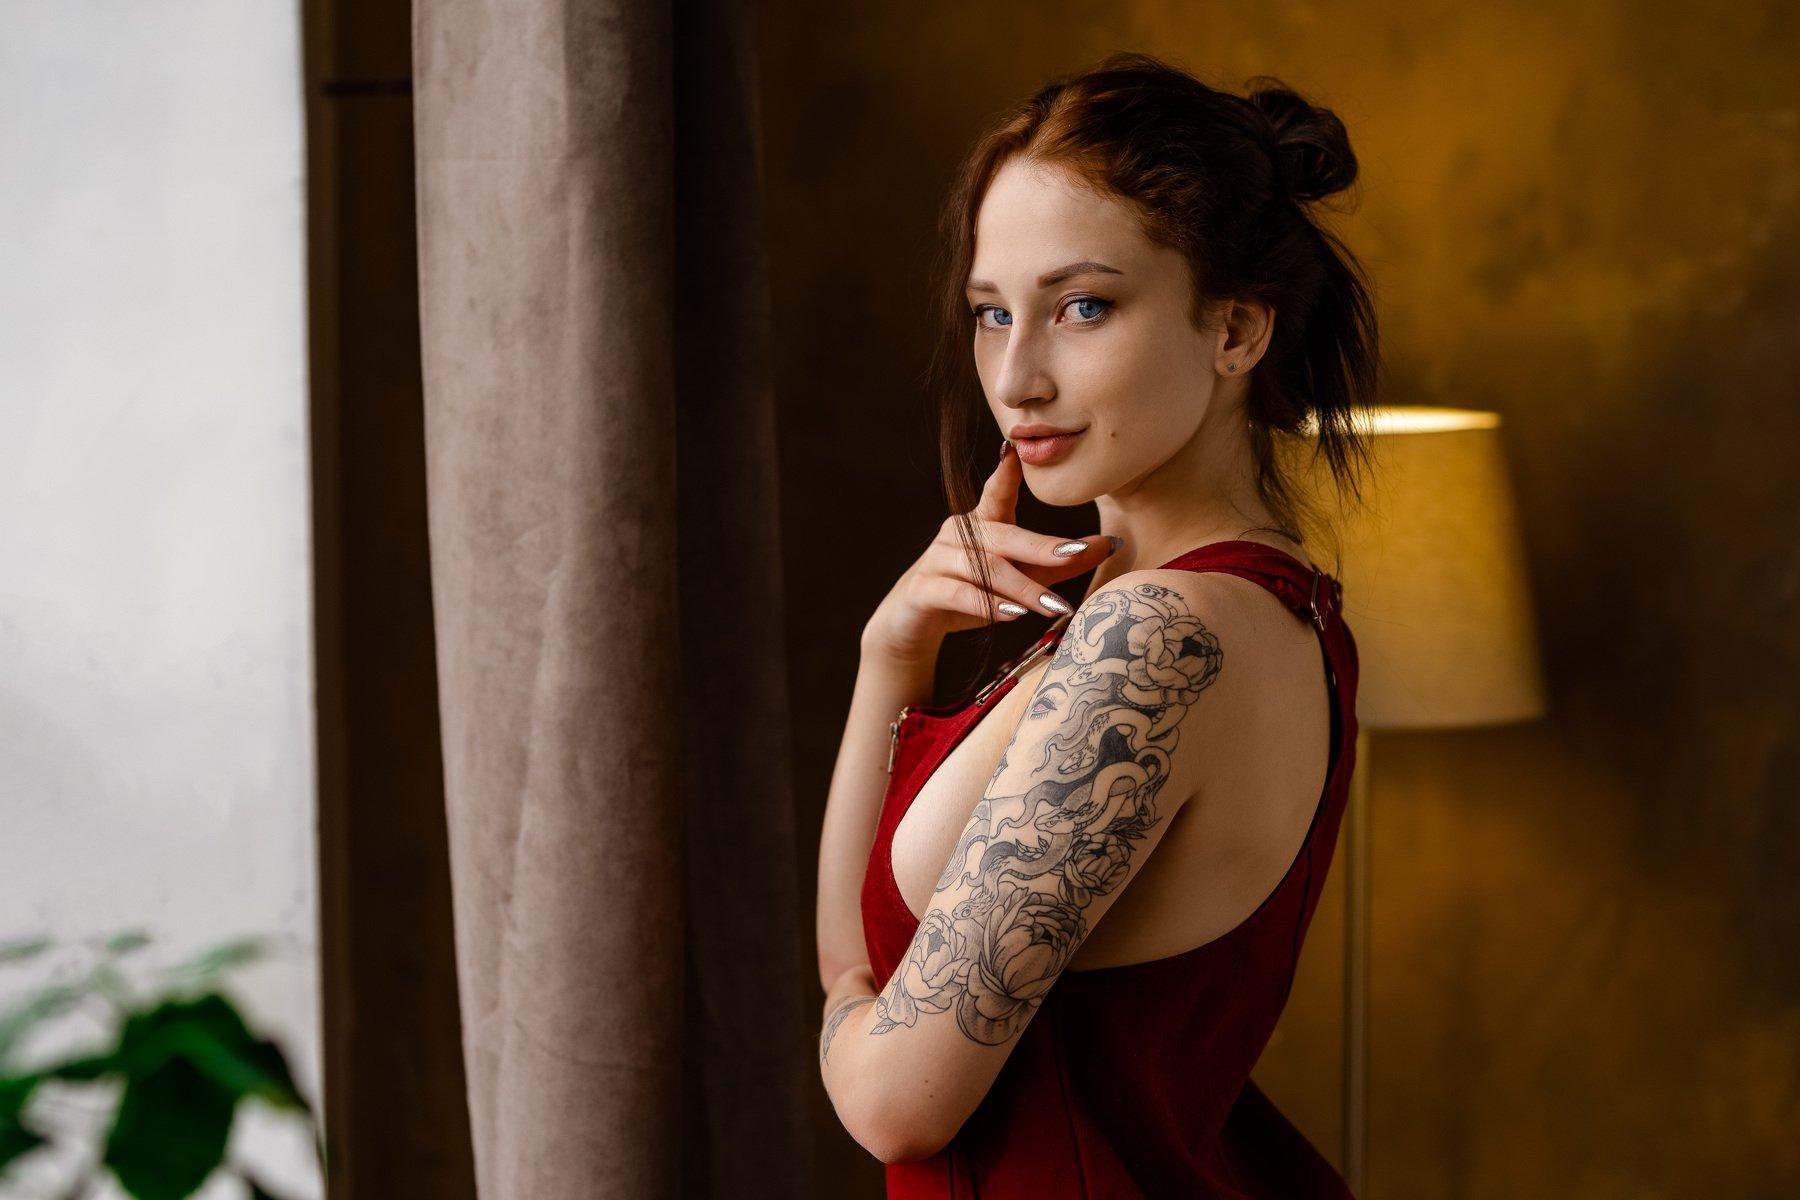 girl nude studio daylight portrait, Пистолетов Илья